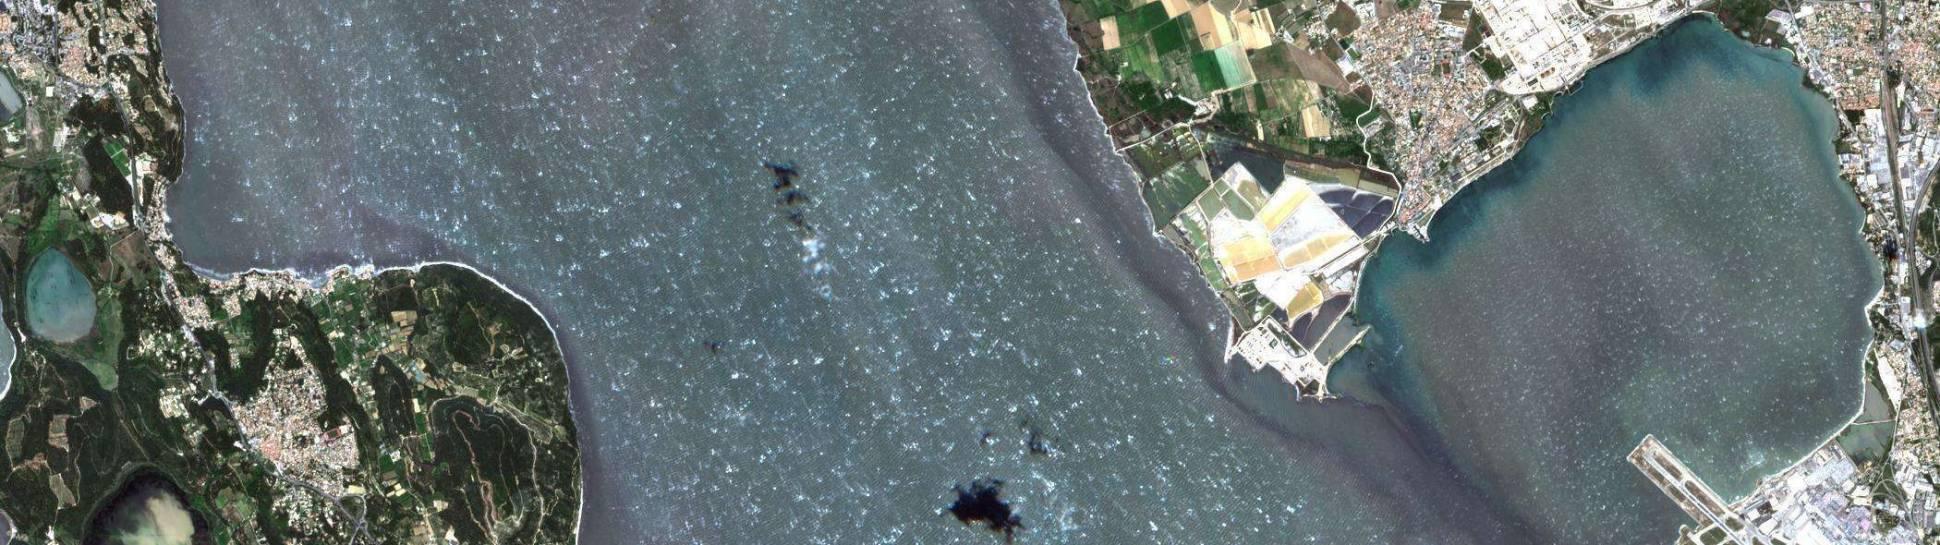 Photo satellite 5 mai 2019 (Sentinel 2)